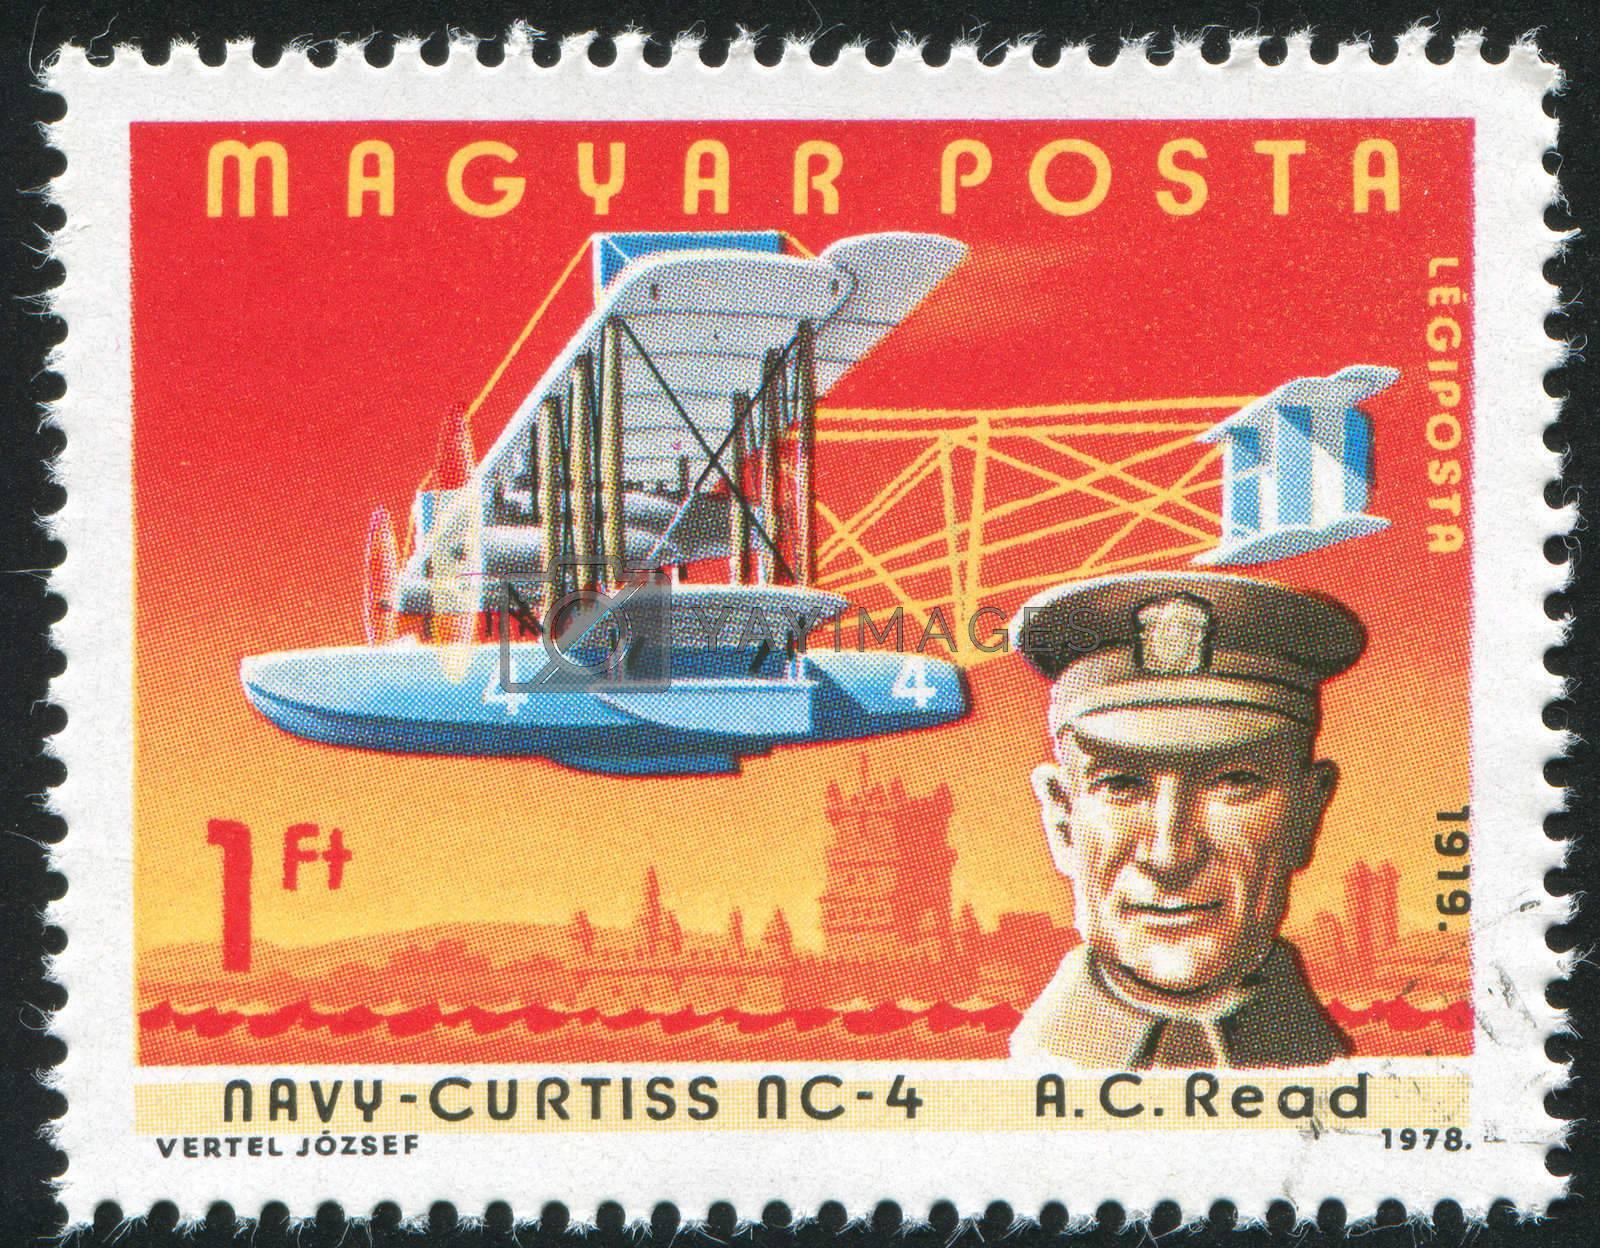 HUNGARY - CIRCA 1978: stamp printed by Hungary, shows aeroplane, A. C. Read, circa 1978